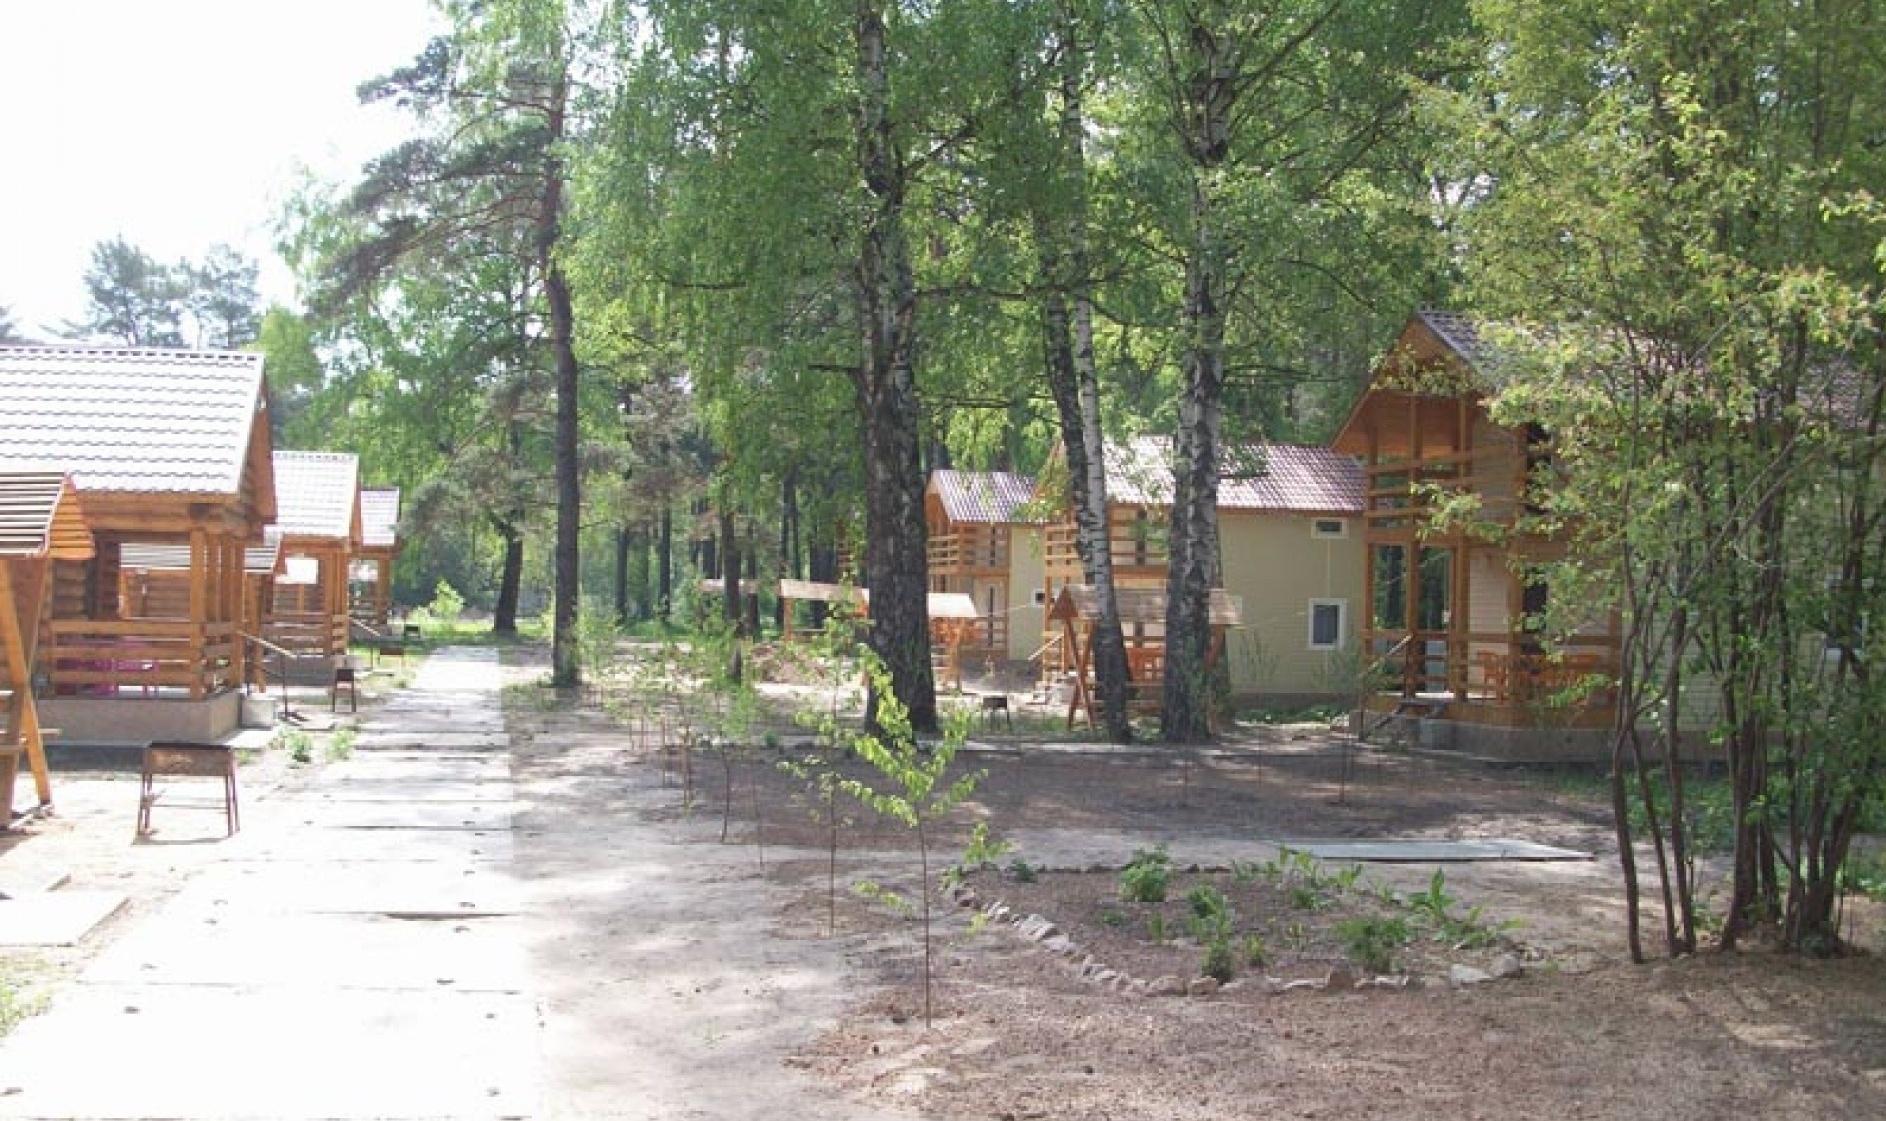 База отдыха «Лебяжье» Республика Татарстан, фото 5